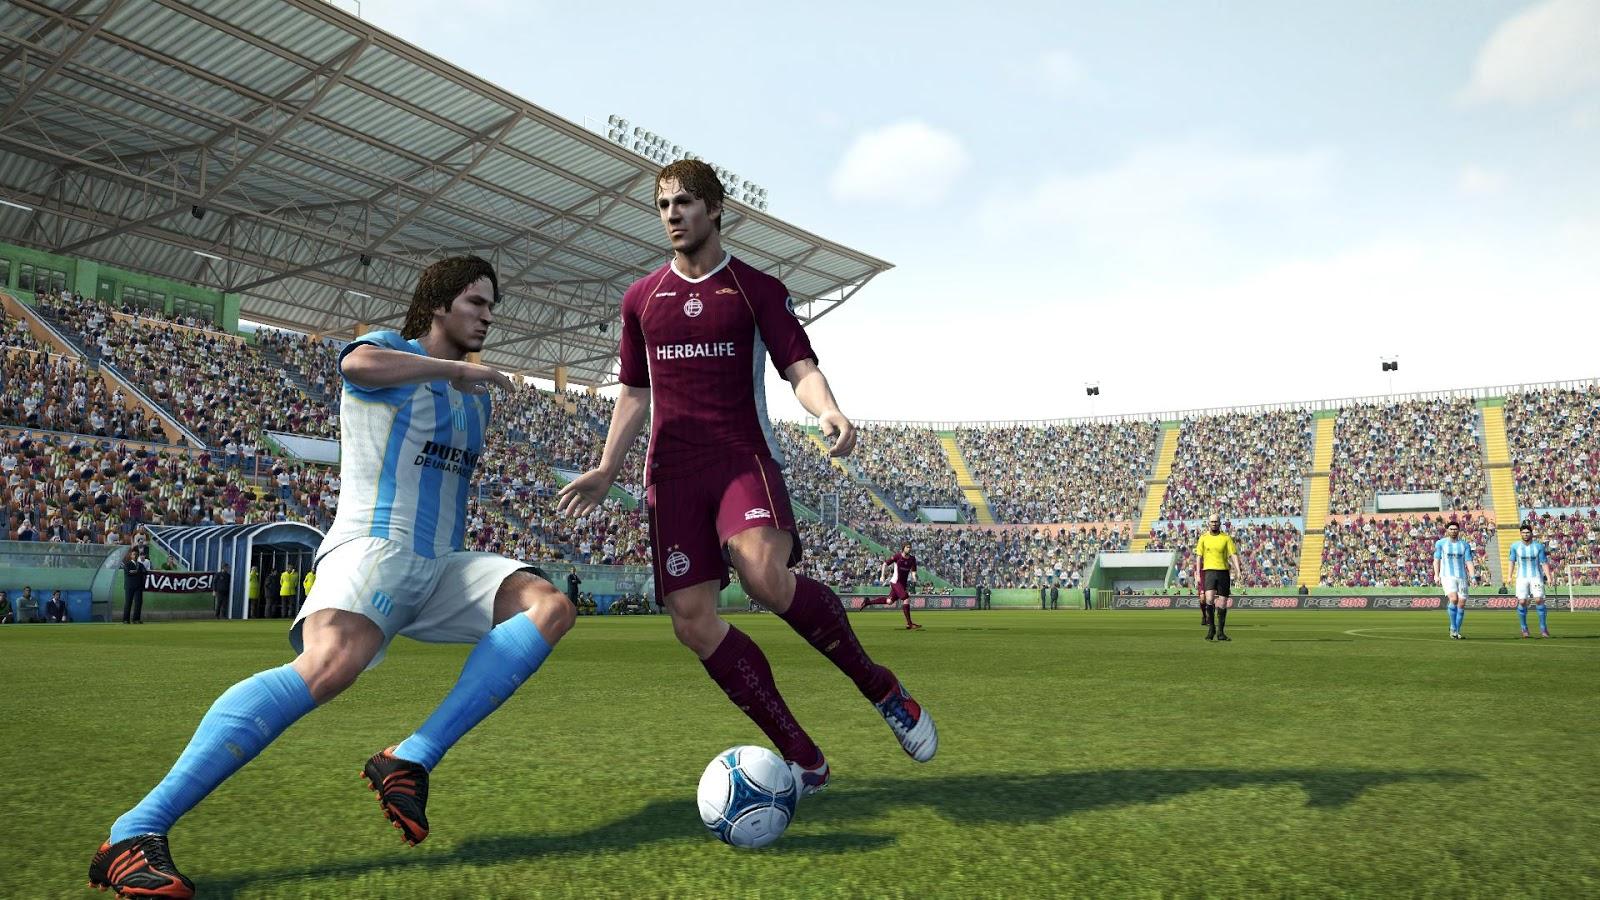 descargar parche liga argentina para pes 2012 pc